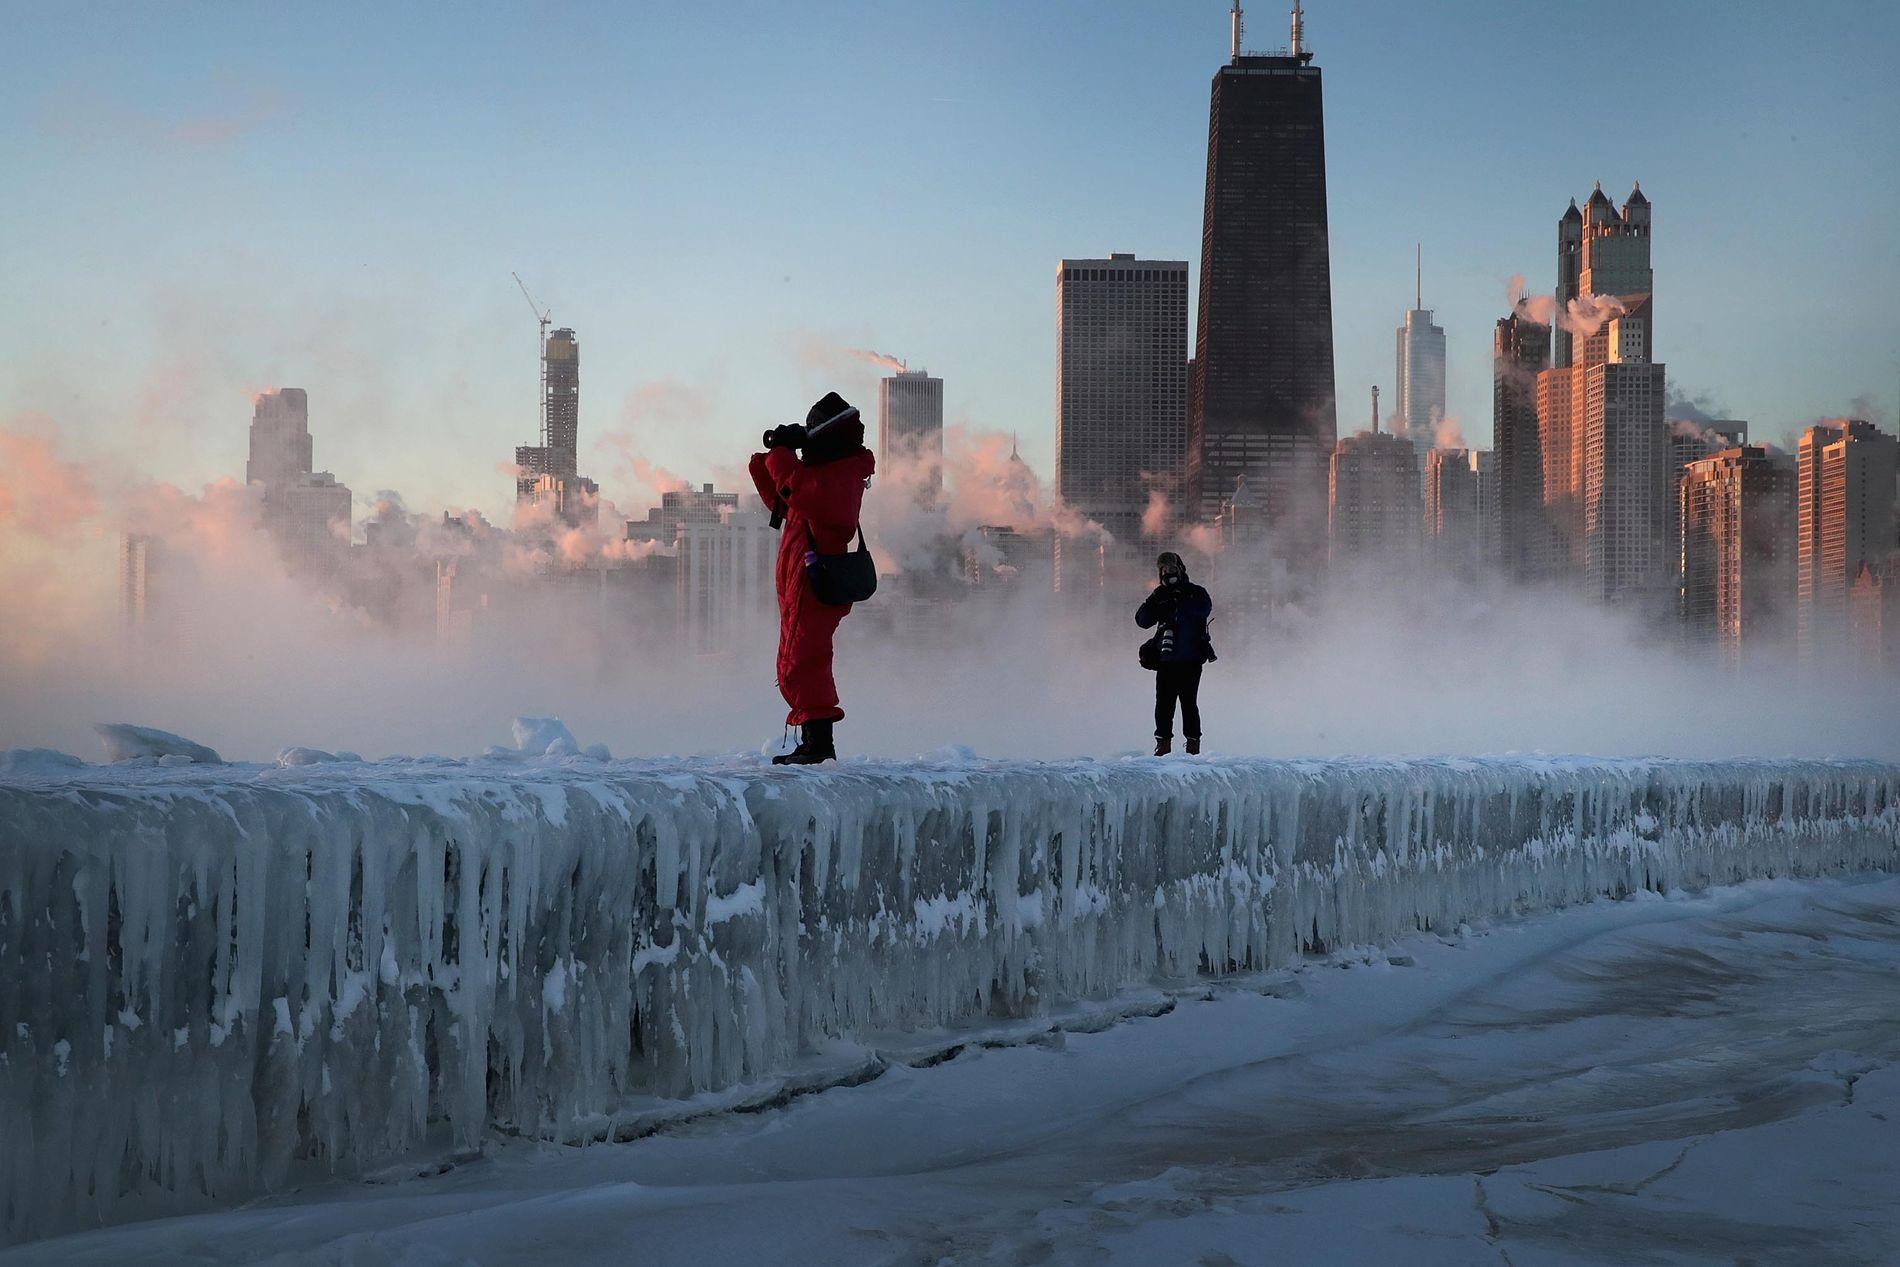 SPRENGKALDT: Frostrøyken stiger foran Chicagos skyline mens amatørfotografer foreviger de kalde øyeblikkene.